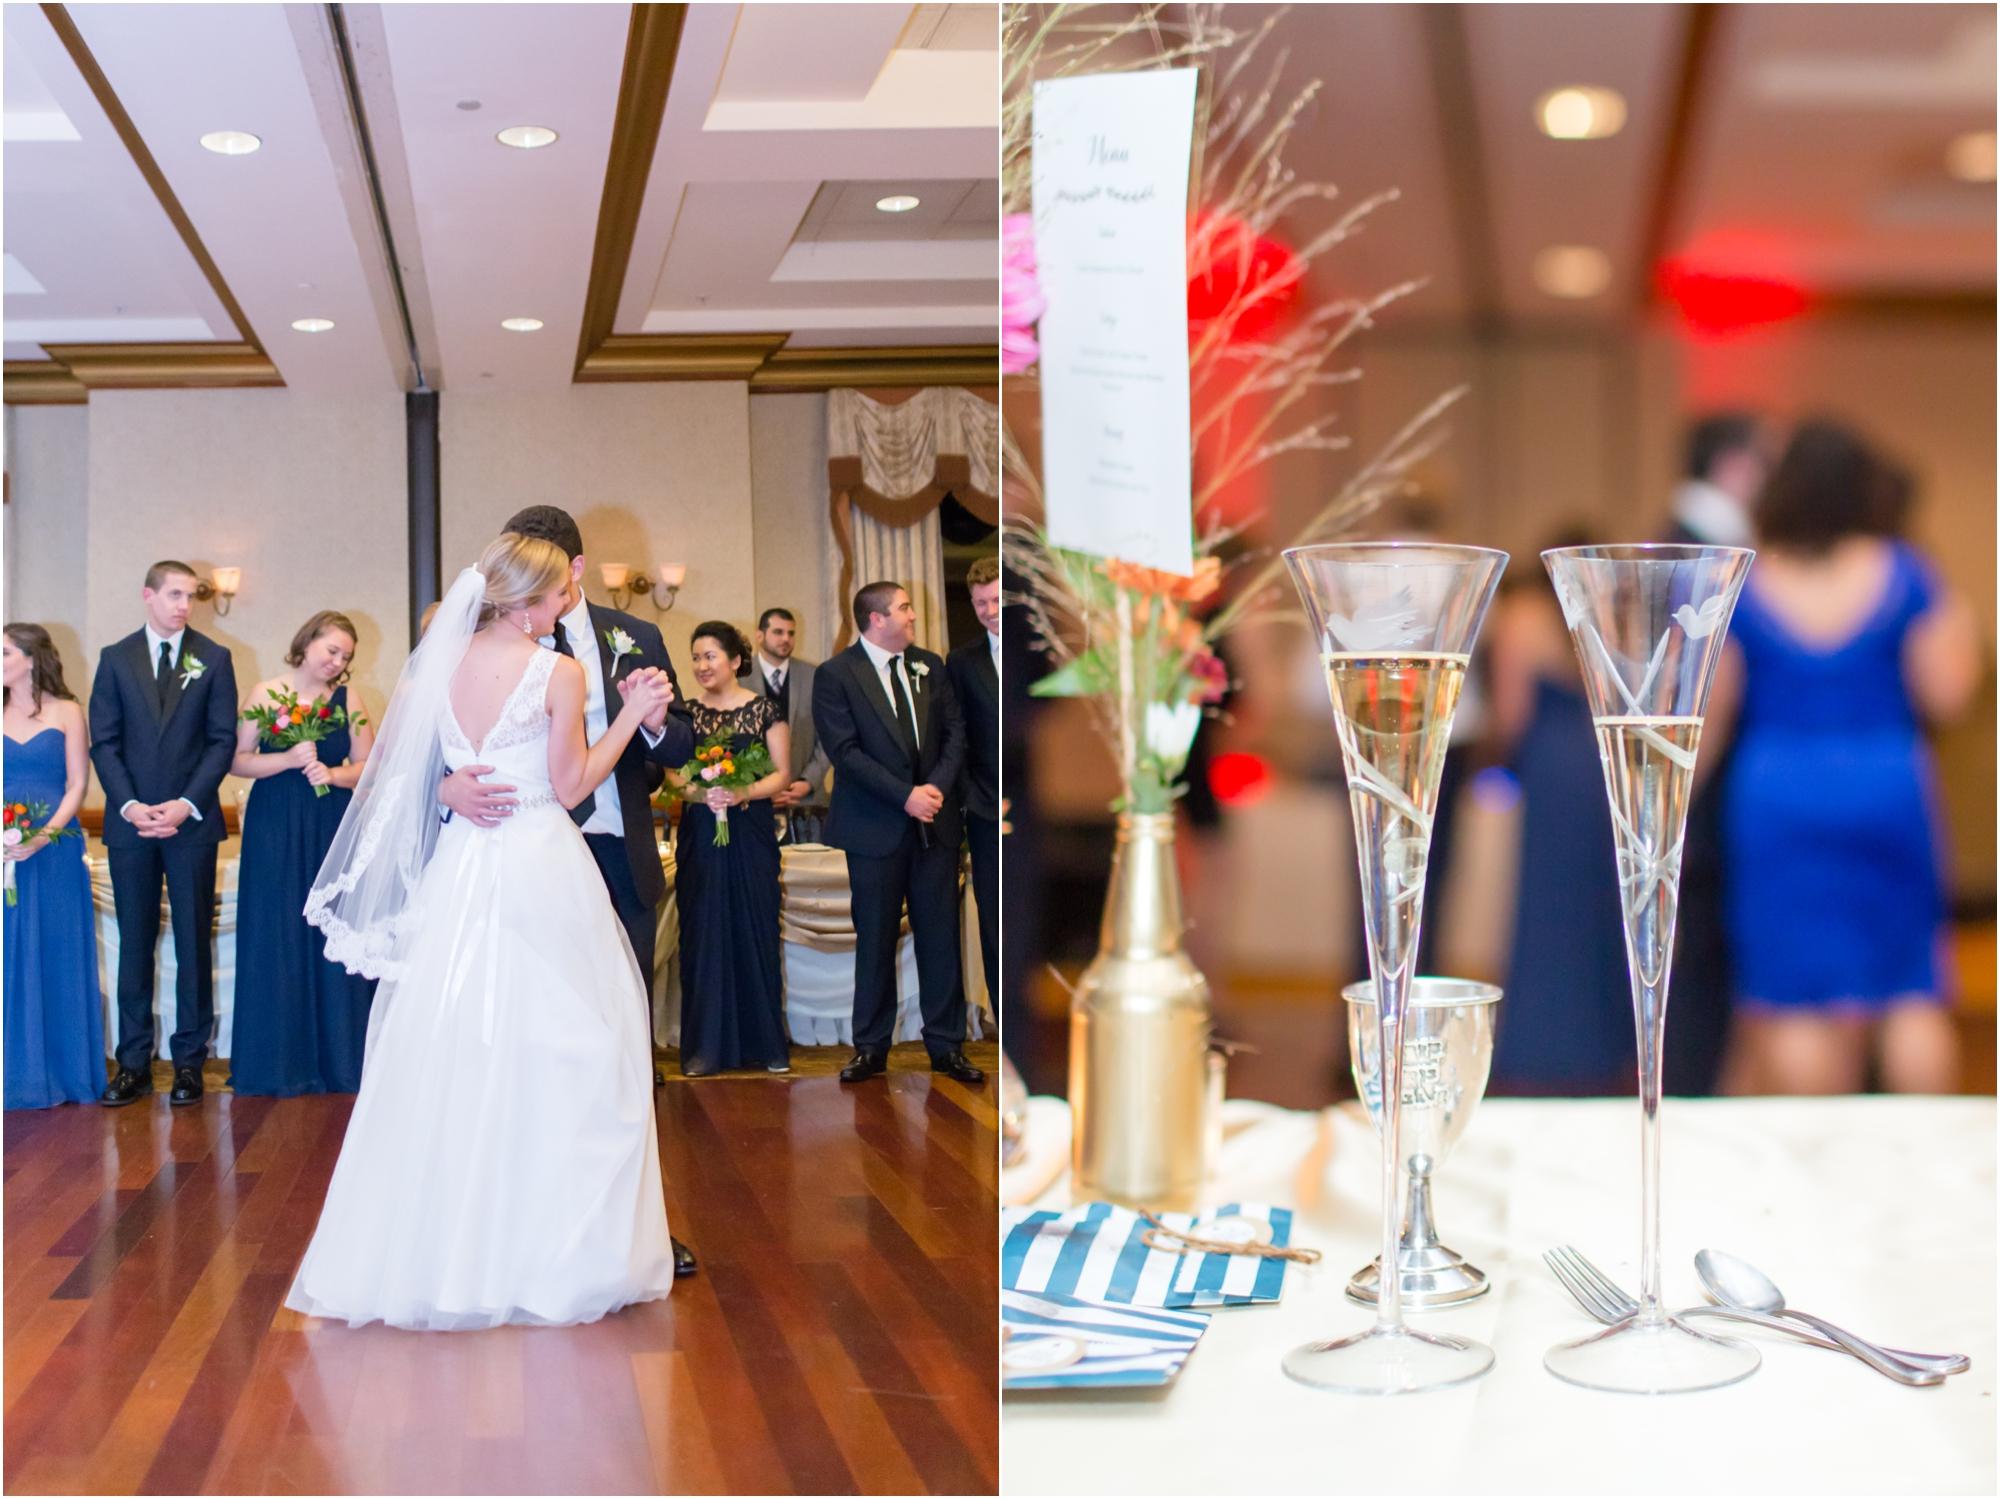 6-Finkel Wedding Reception-780_anna grace photography maryland wedding photographer turf valley.jpg